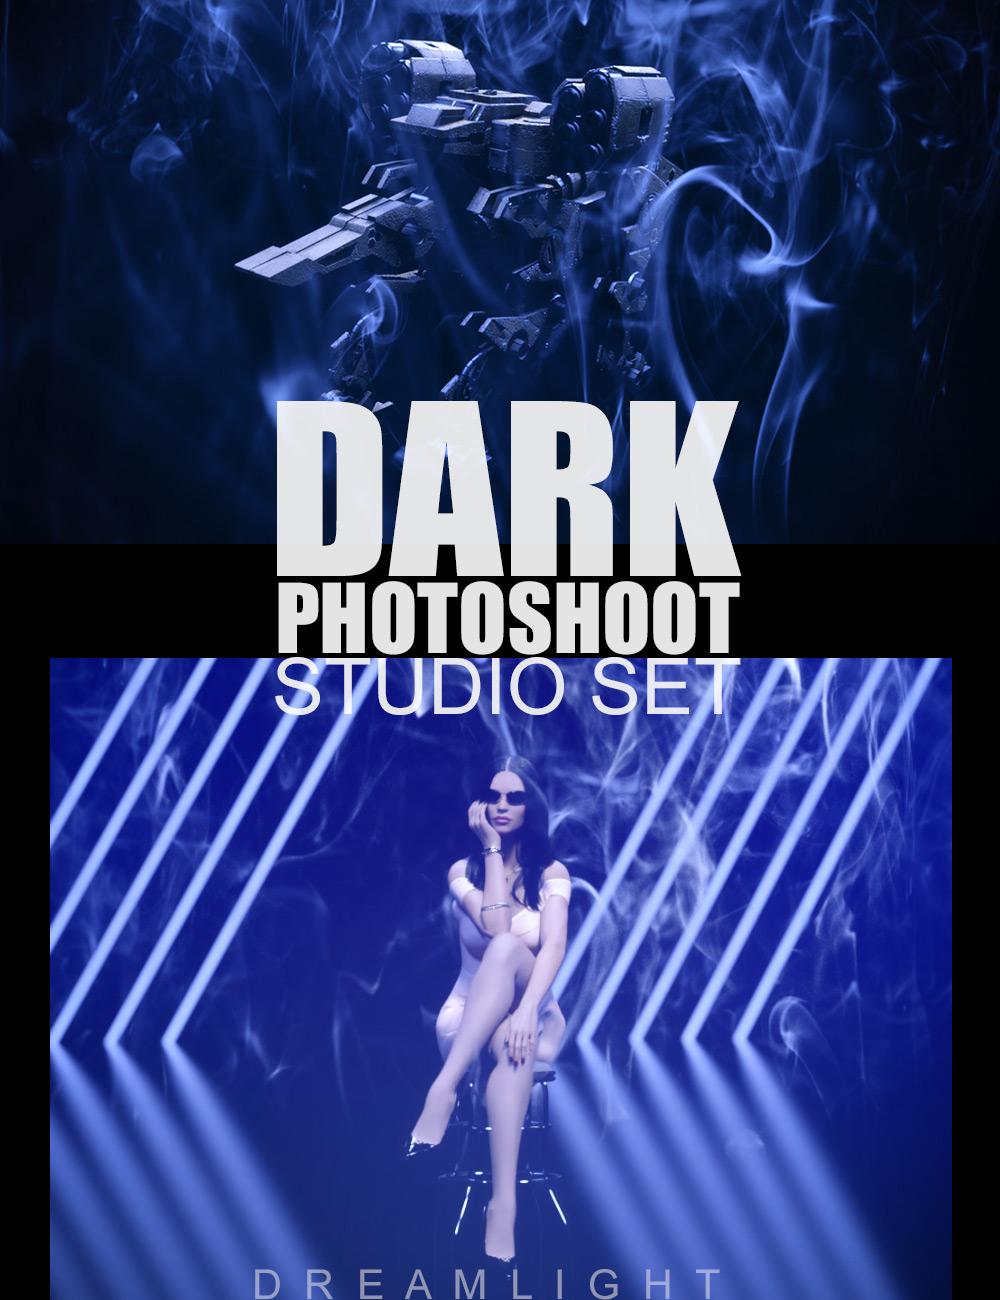 Dark Photoshoot Studio Set by: Dreamlight, 3D Models by Daz 3D